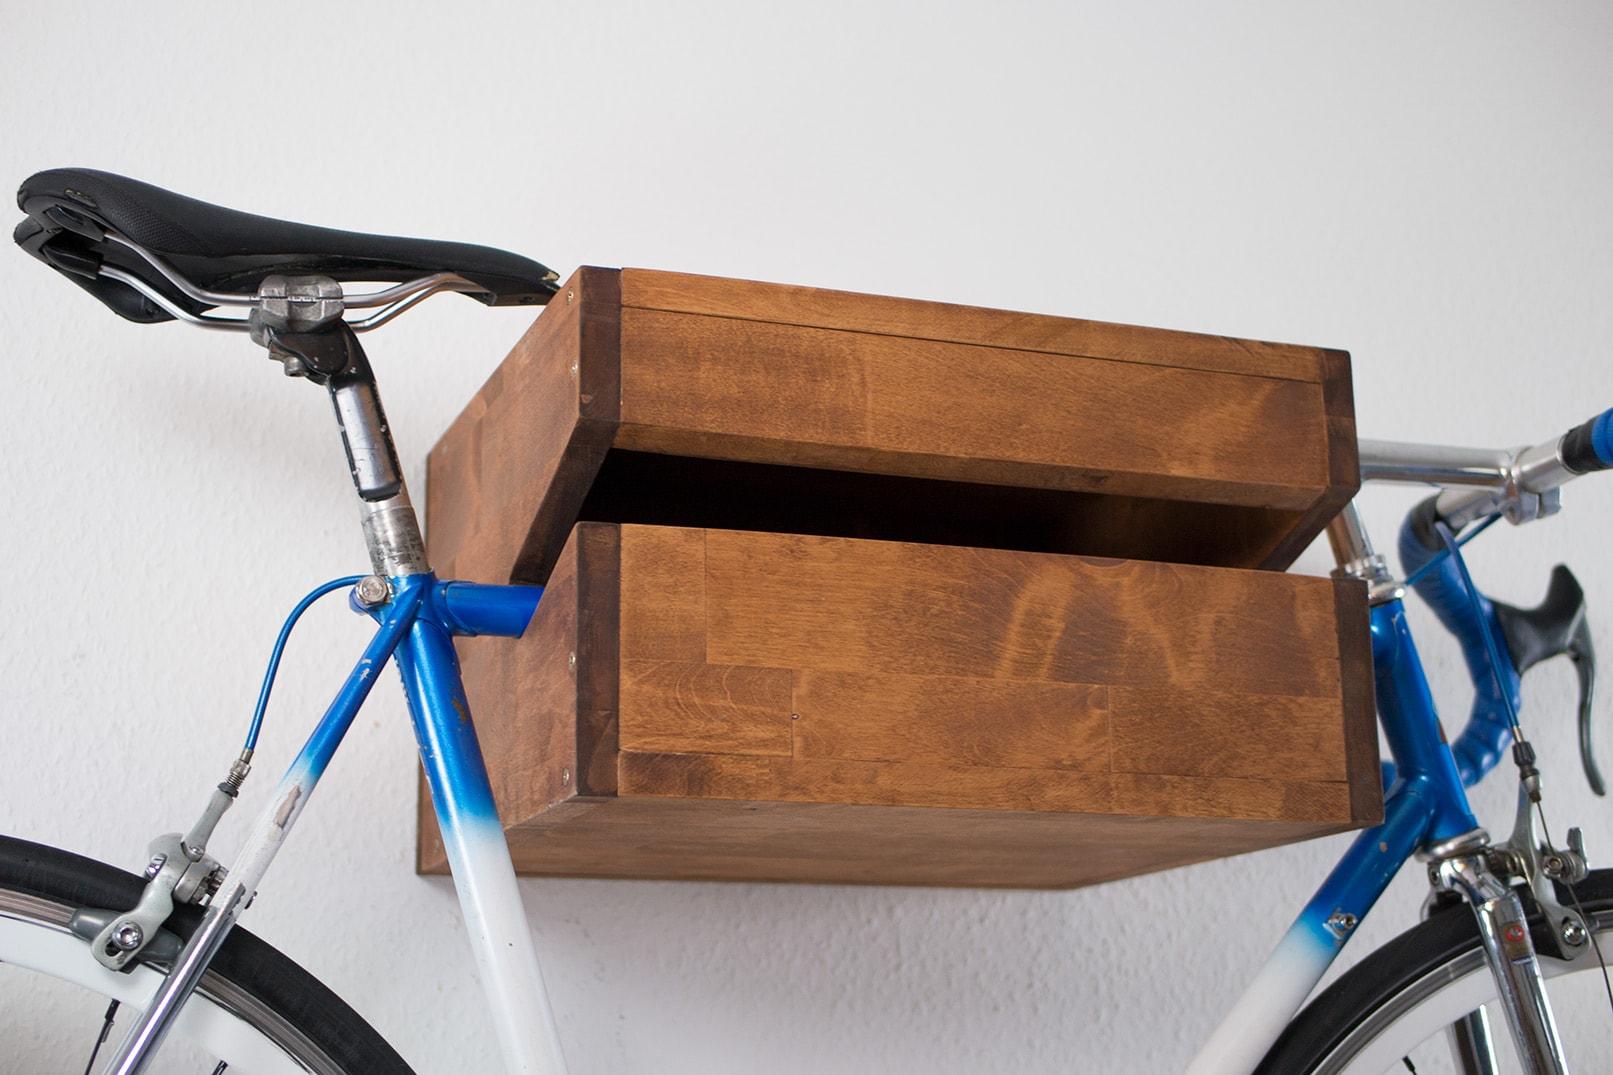 Fahrradregal Selbstgebaut Fahrradreparatur Net